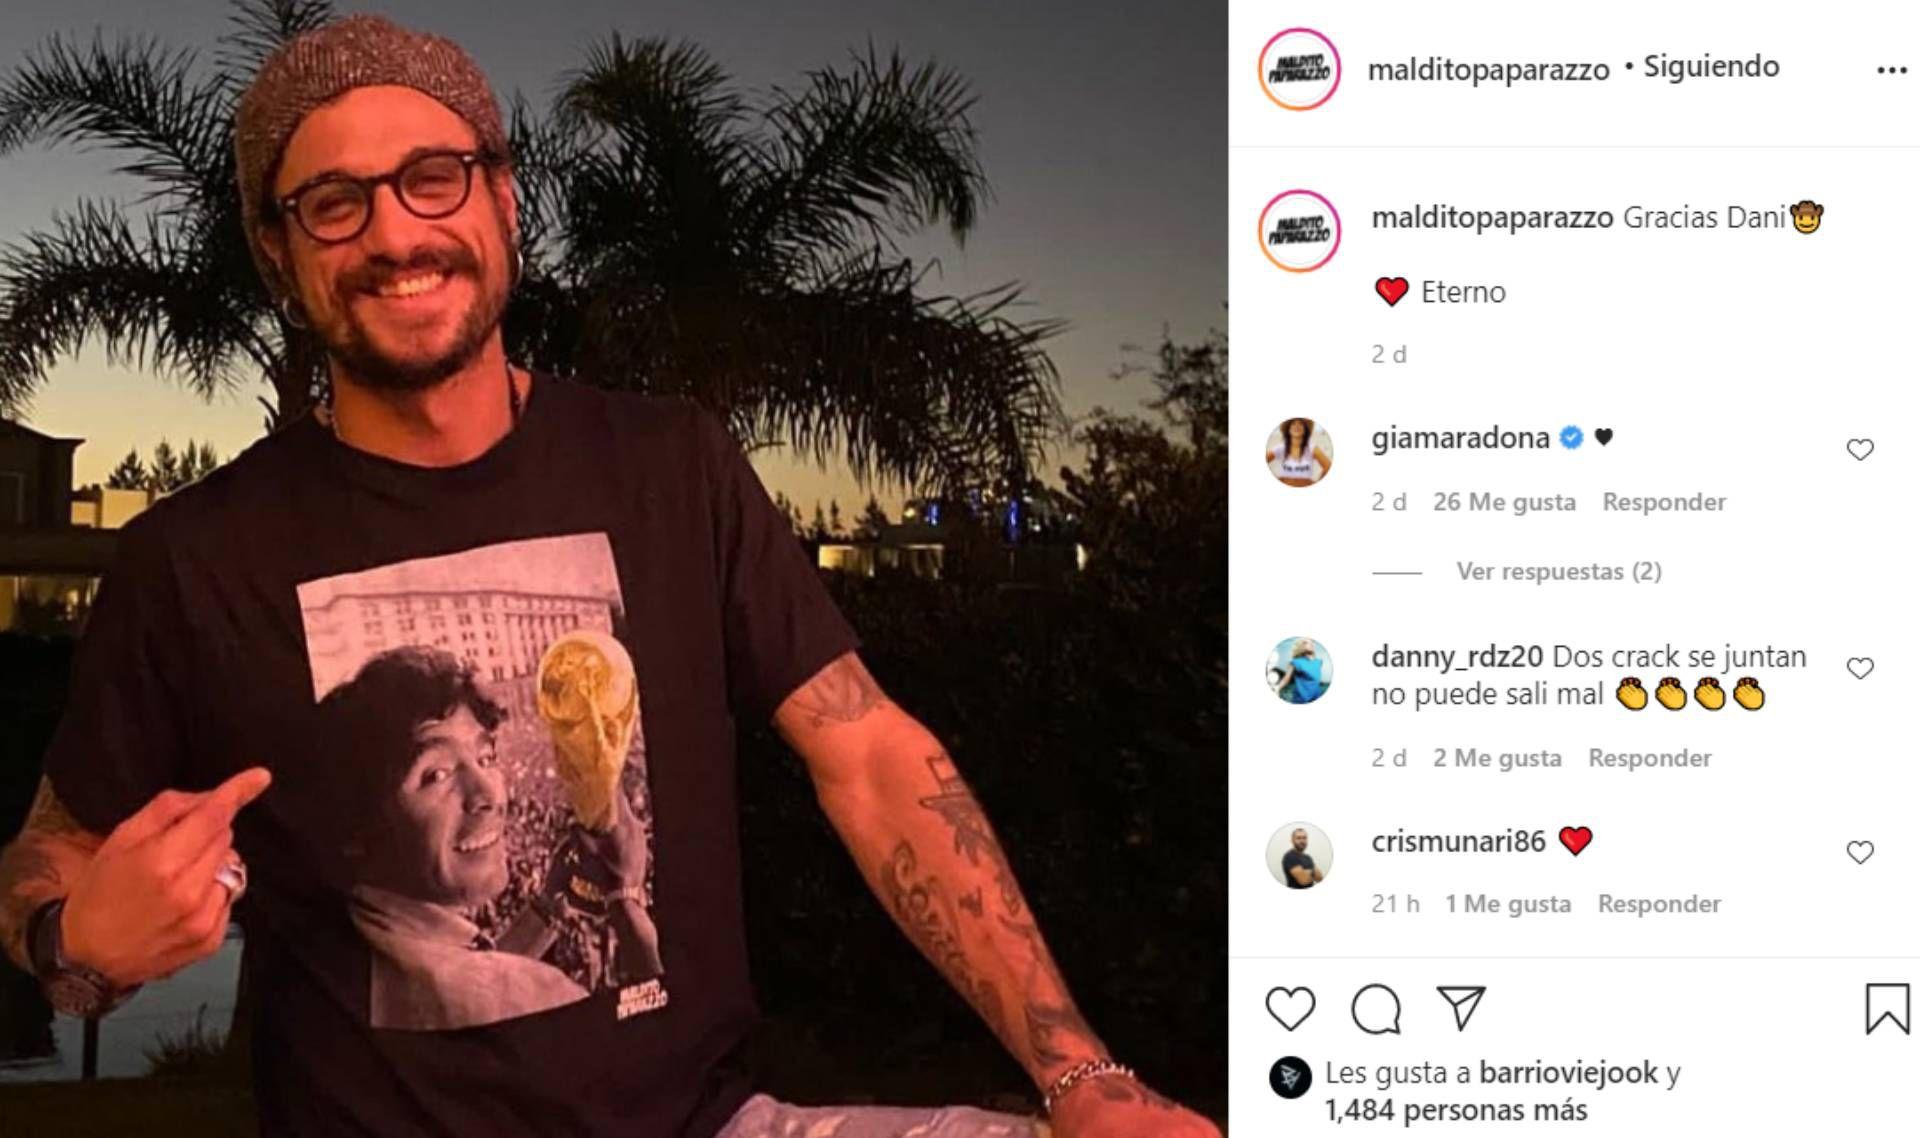 Daniel Osvaldo con una remera de Maradona